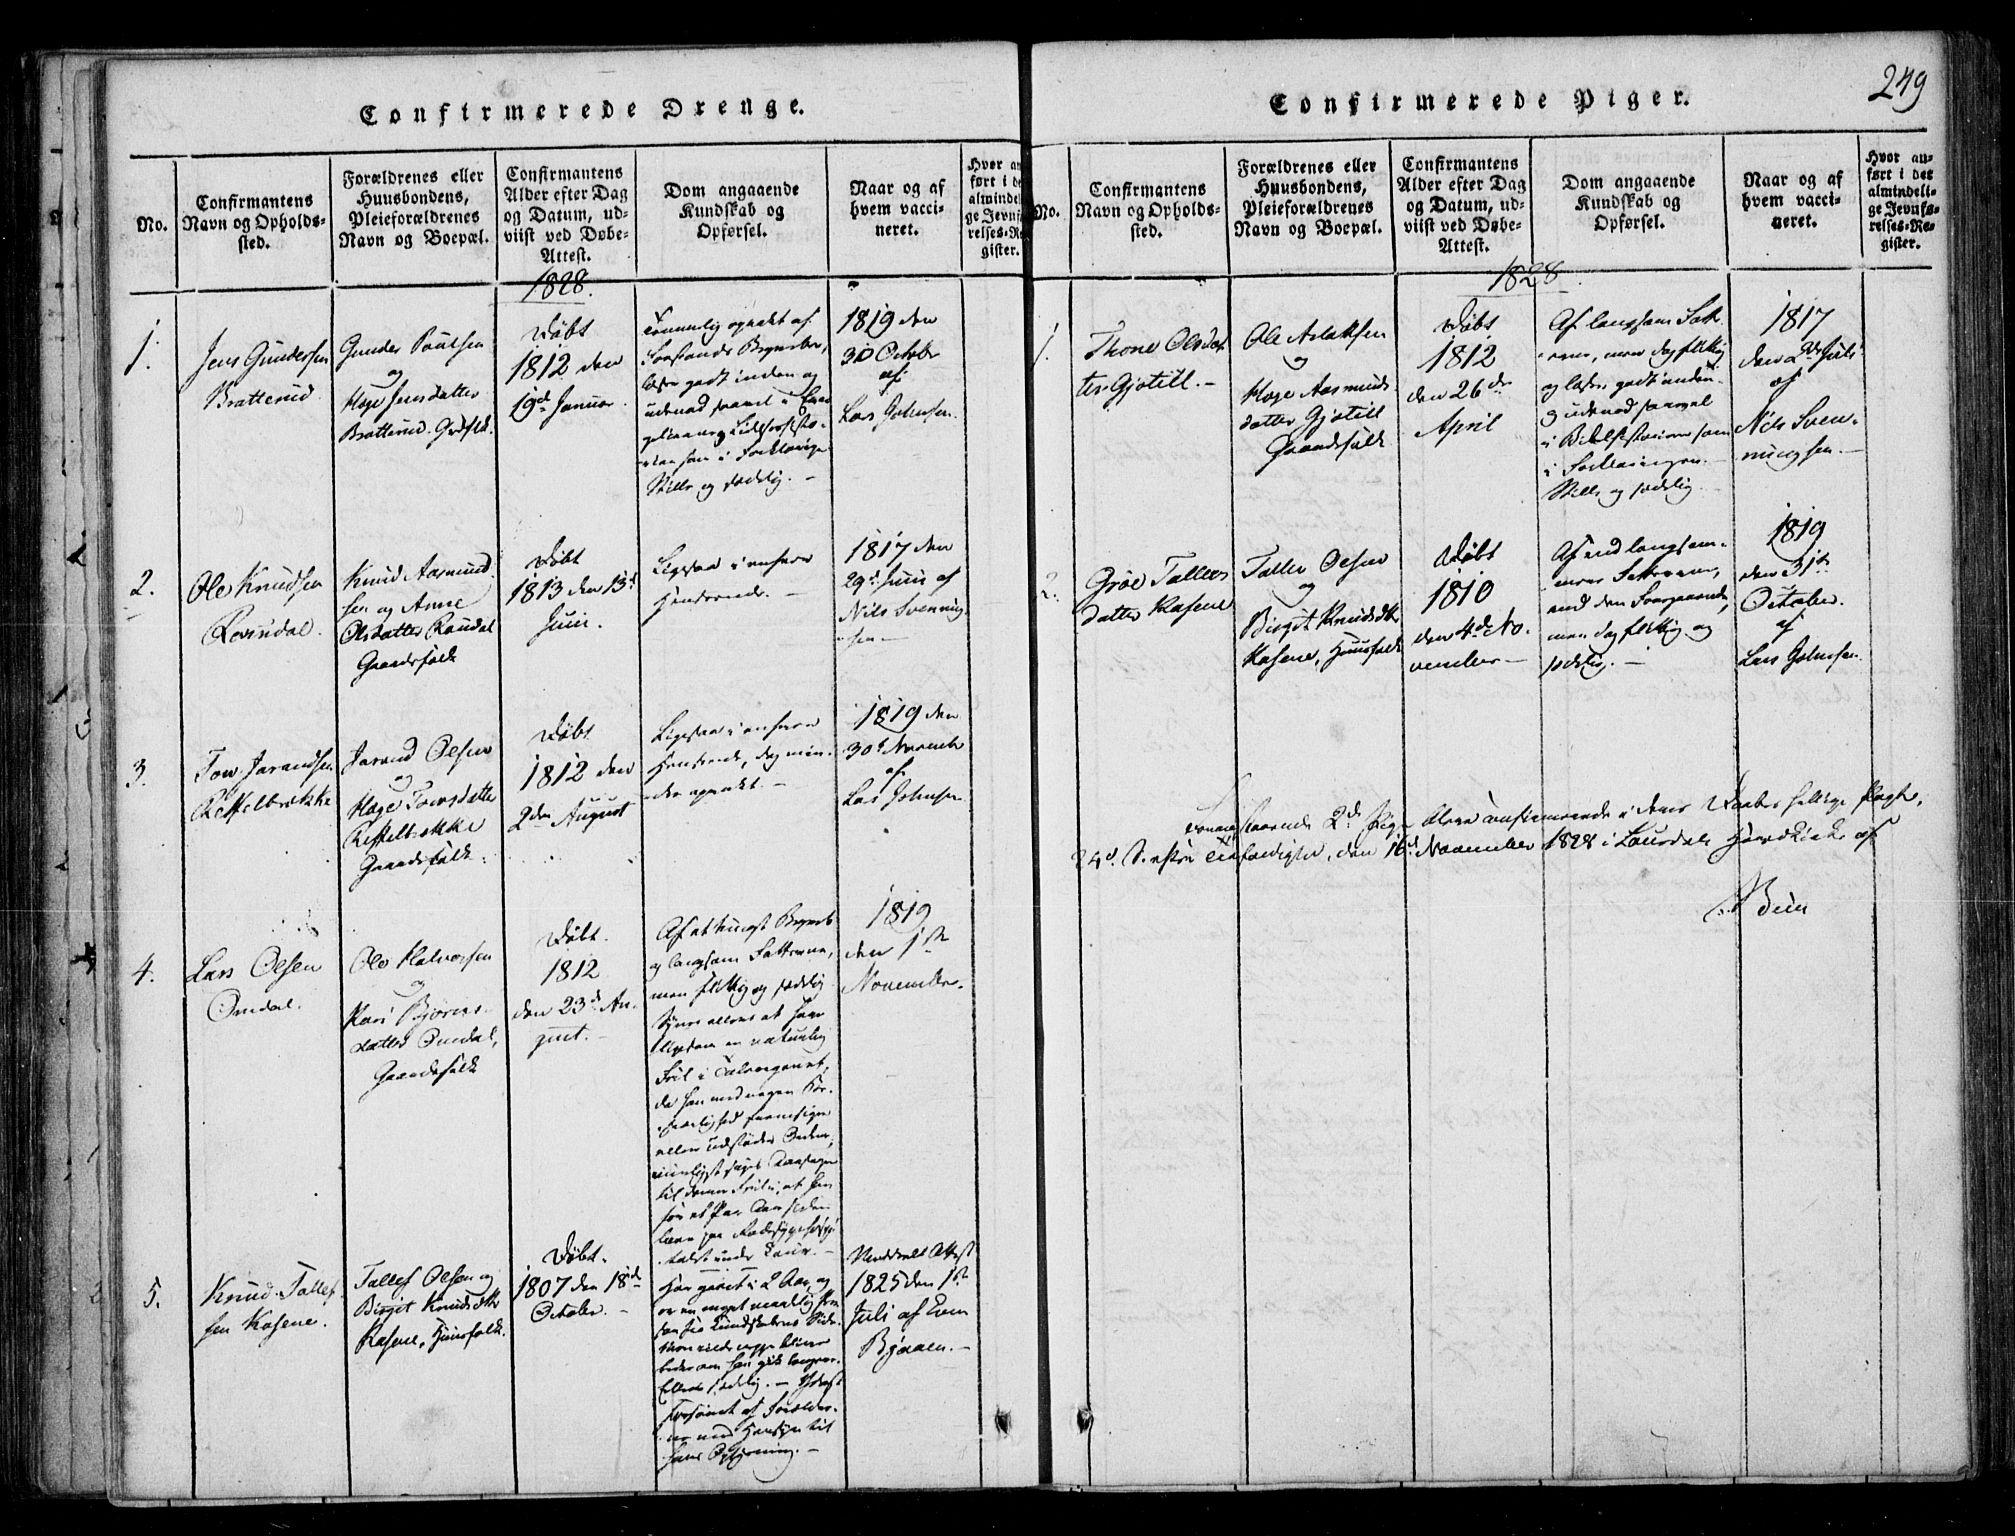 SAKO, Lårdal kirkebøker, F/Fb/L0001: Ministerialbok nr. II 1, 1815-1860, s. 249